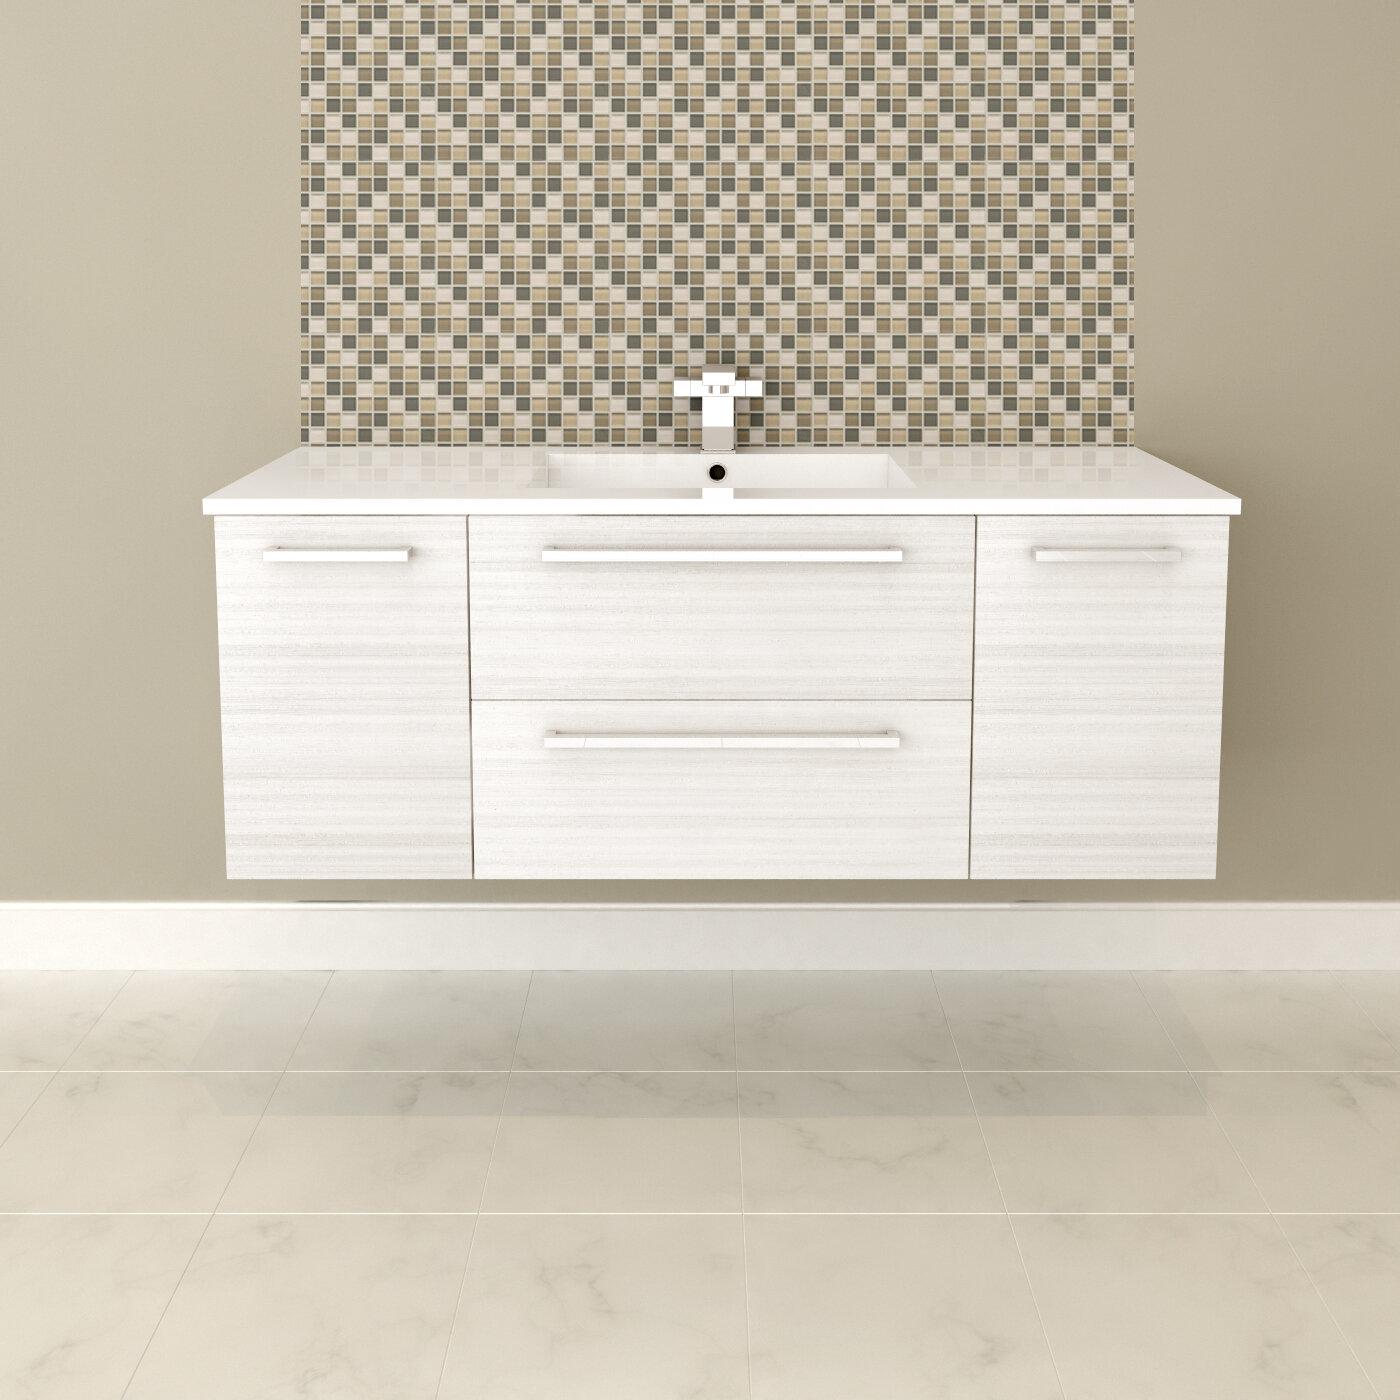 "McPeak 3"" Wall-Mounted Single Bathroom Vanity Set"